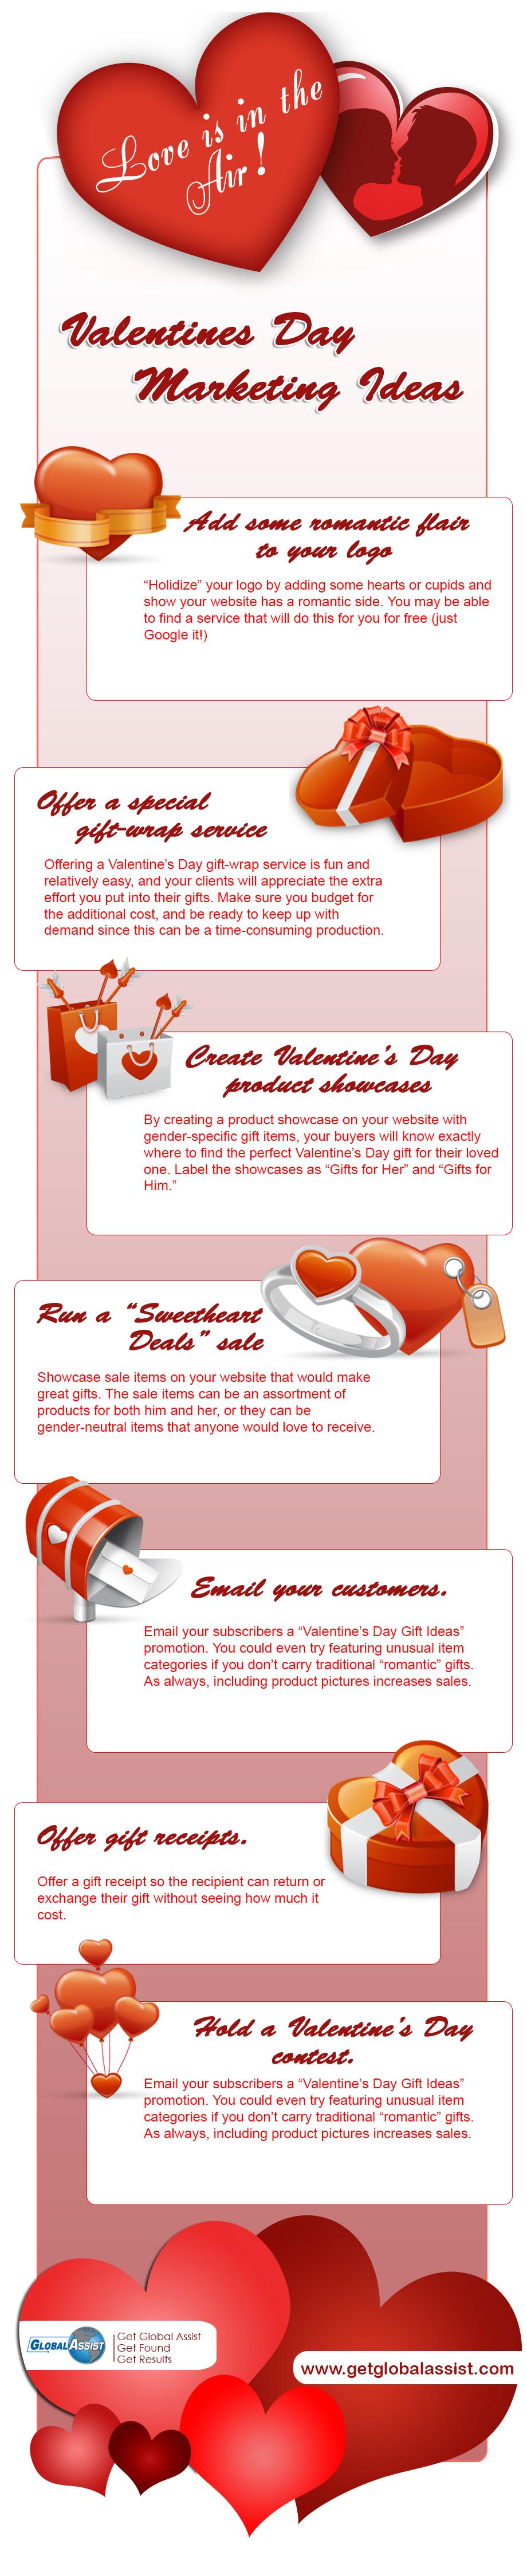 Valentine S Day Marketing Ideas Get Global Assist Socialmedia